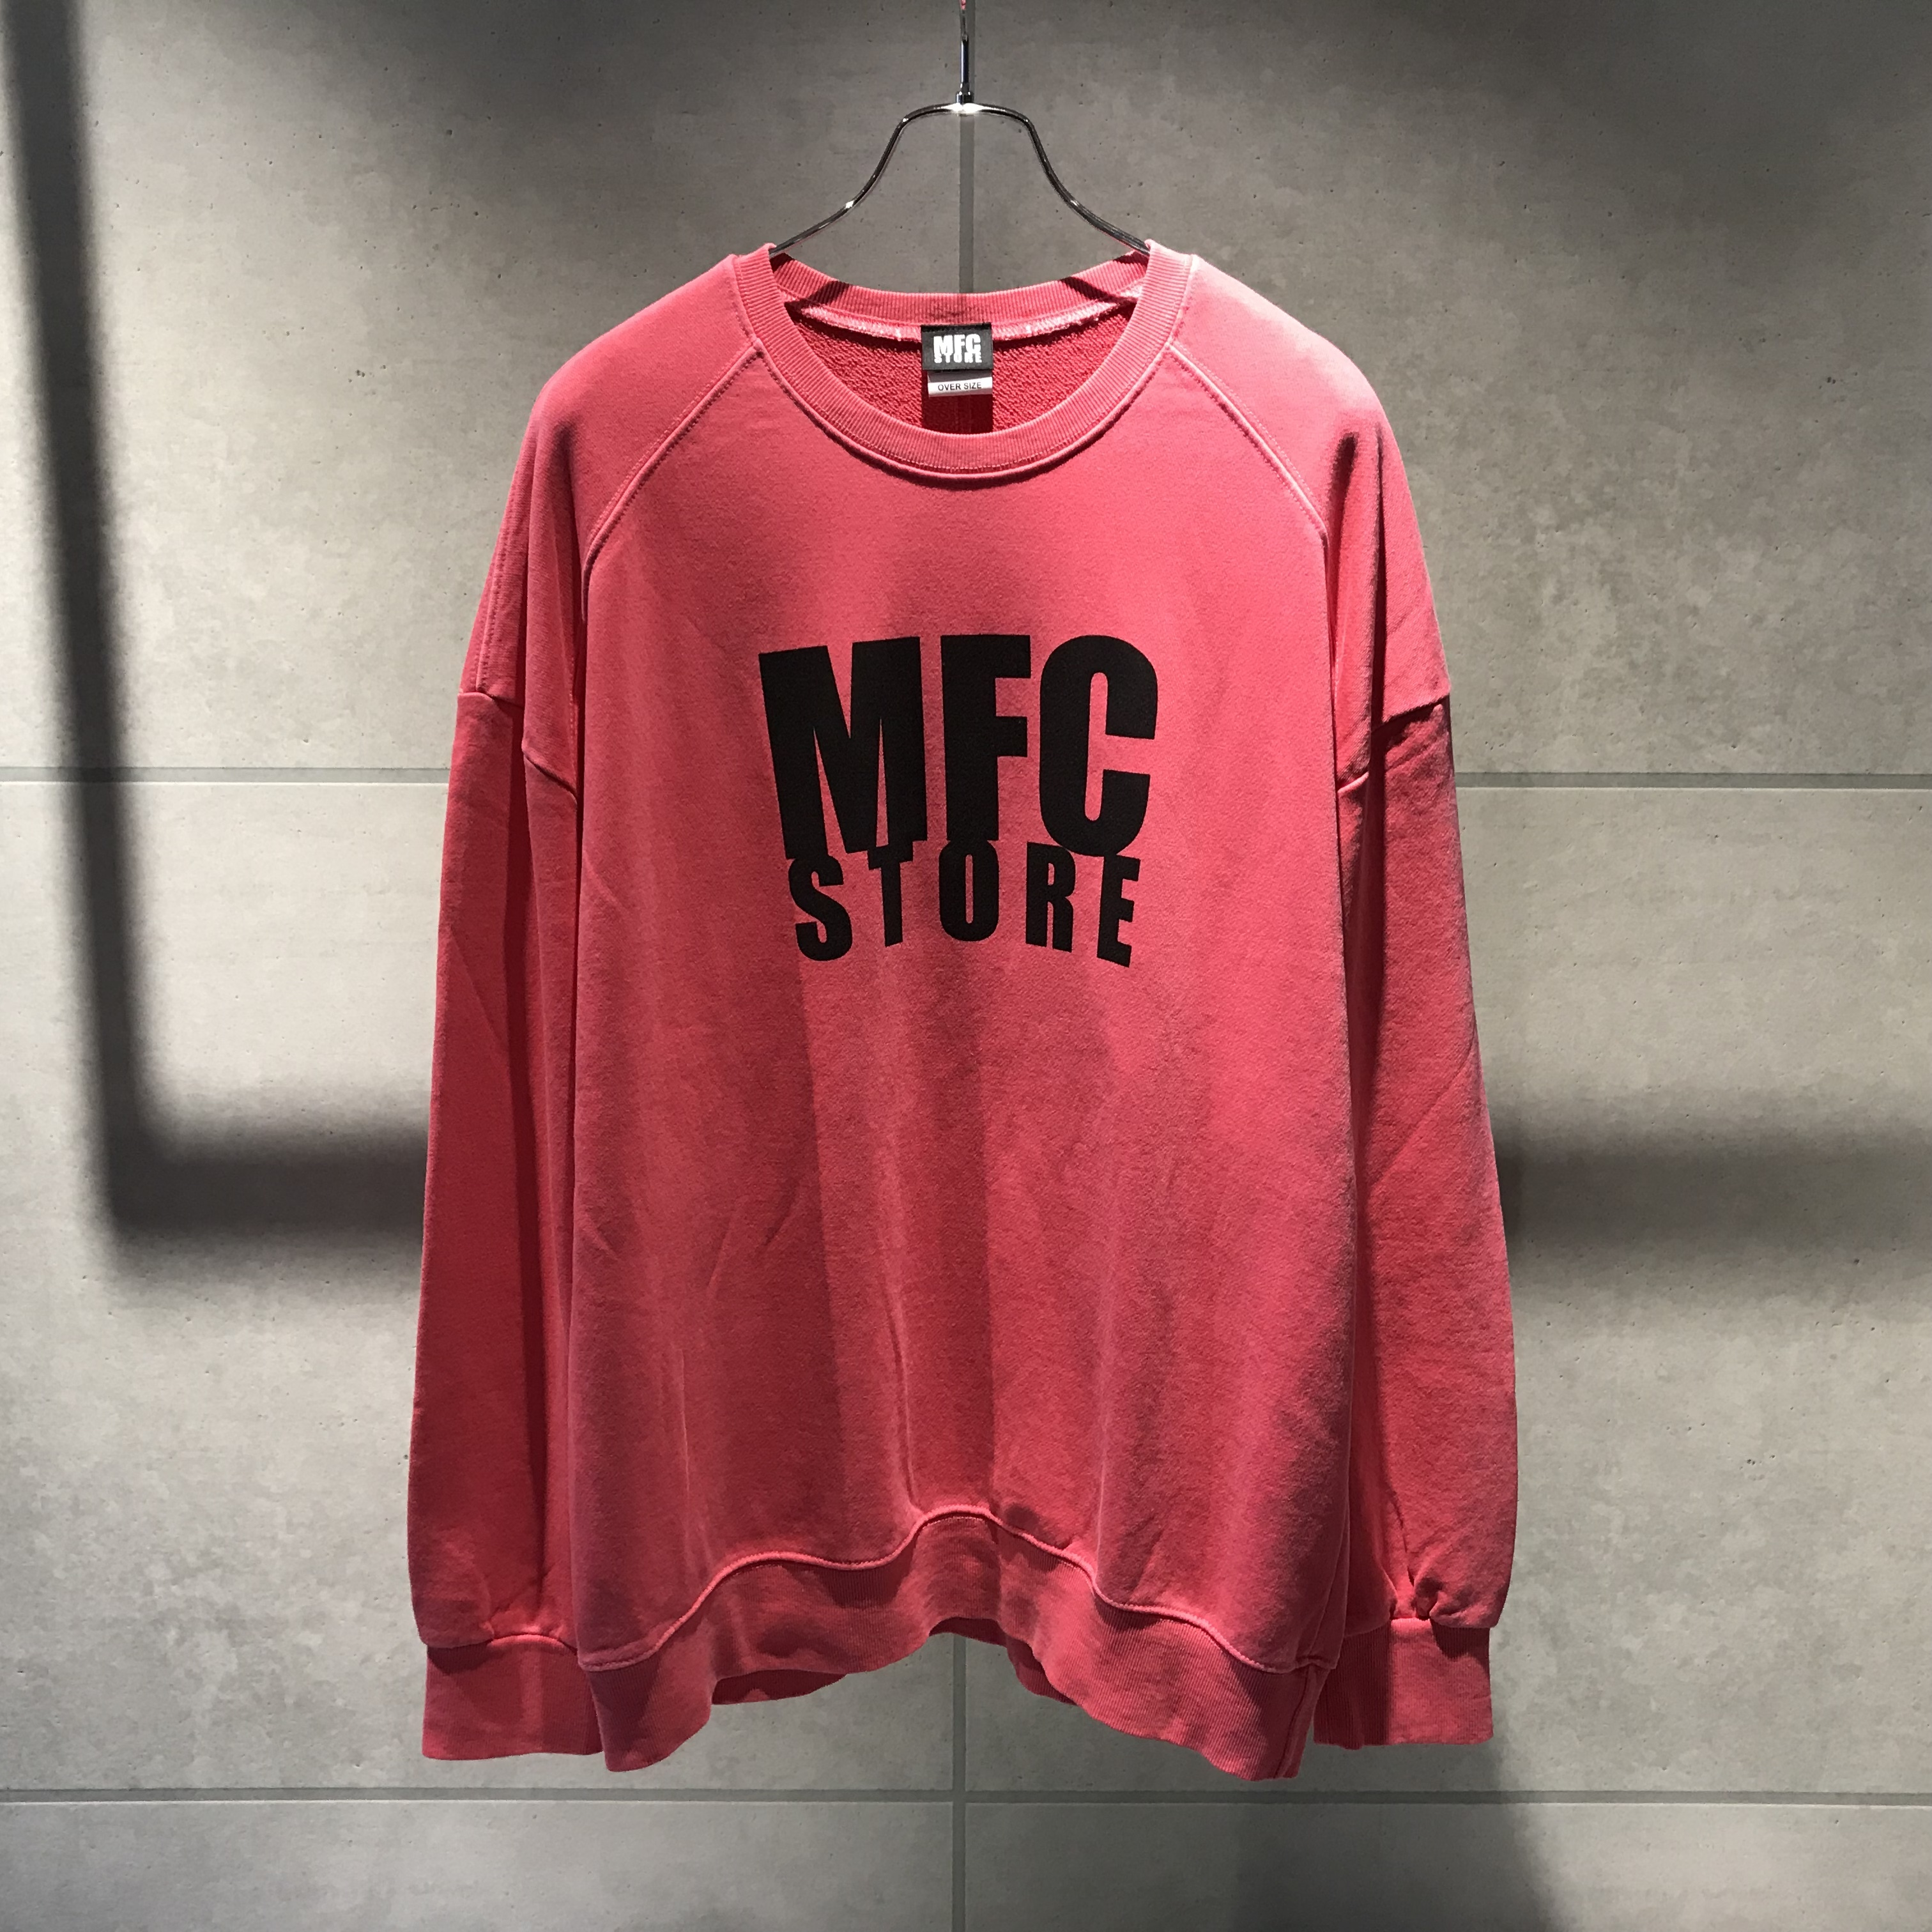 MFC STORE LOGO CREWNECK OVER SWEATSHIRT / HOT PINK